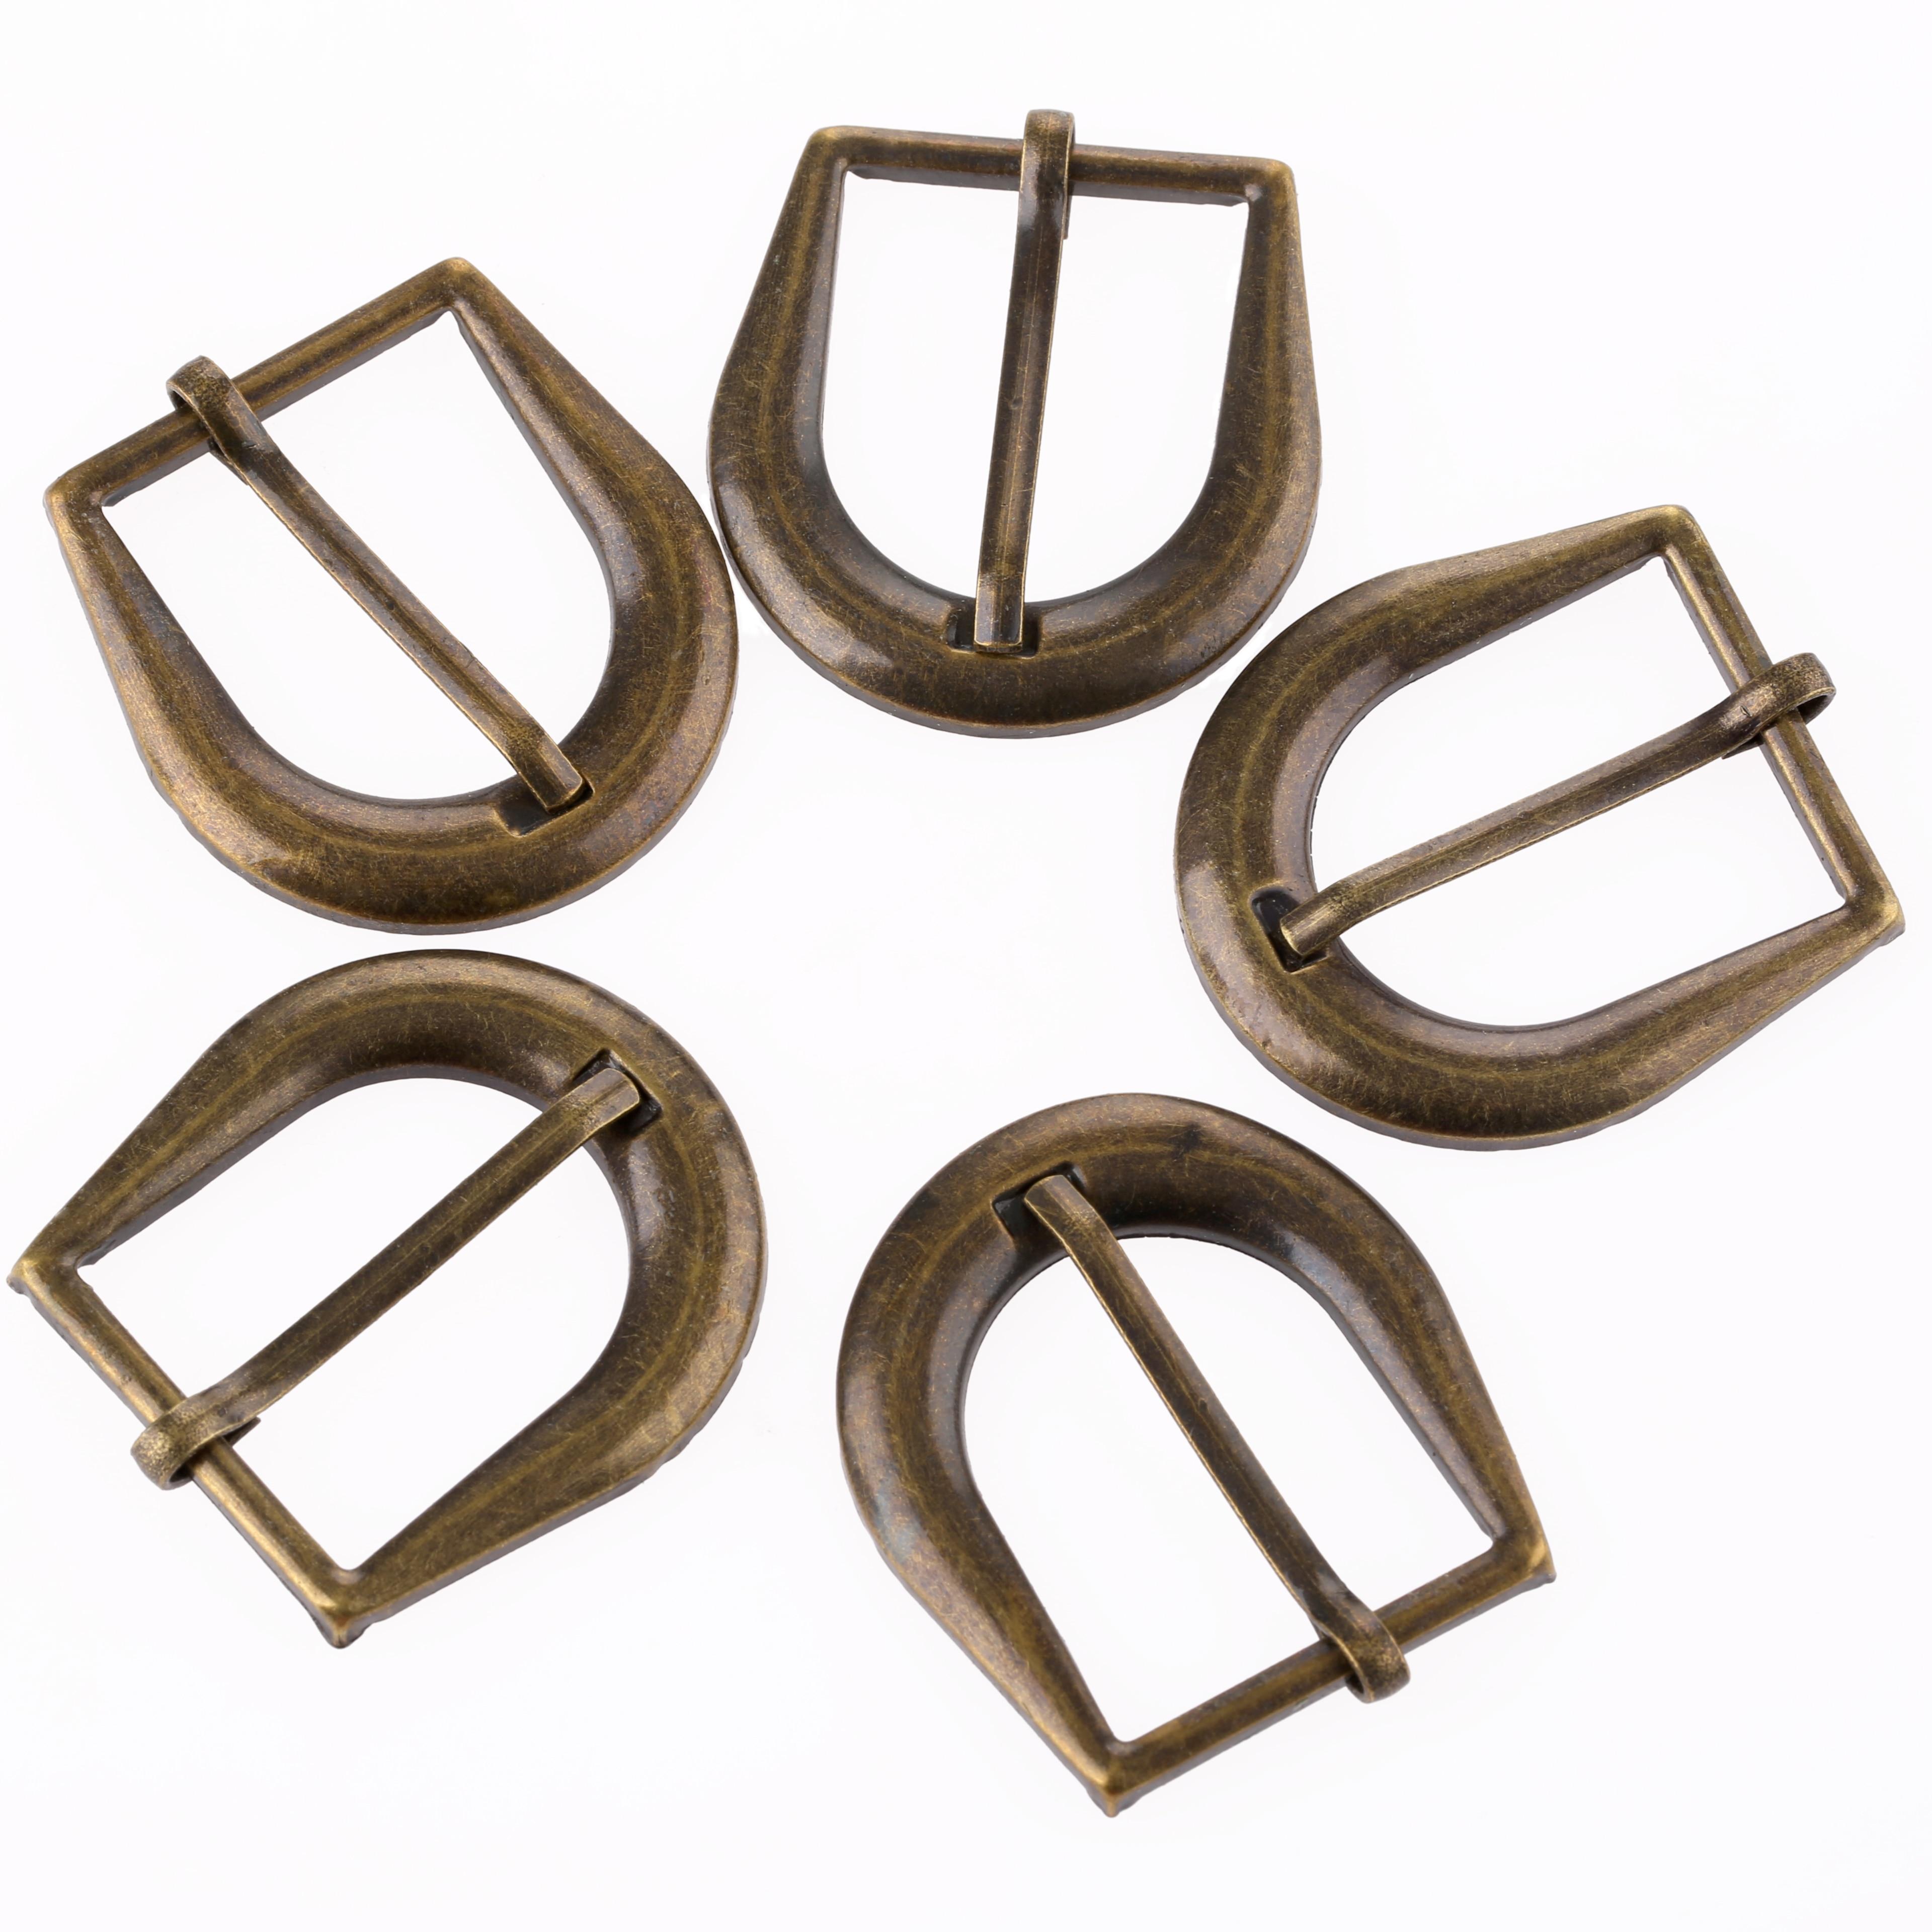 5Pcs Antique Brass Belt Buckles Decorative Jewelry Box Hasp Lock Latch Retro Iron Hardware for Furniture Drawer 42*32mm